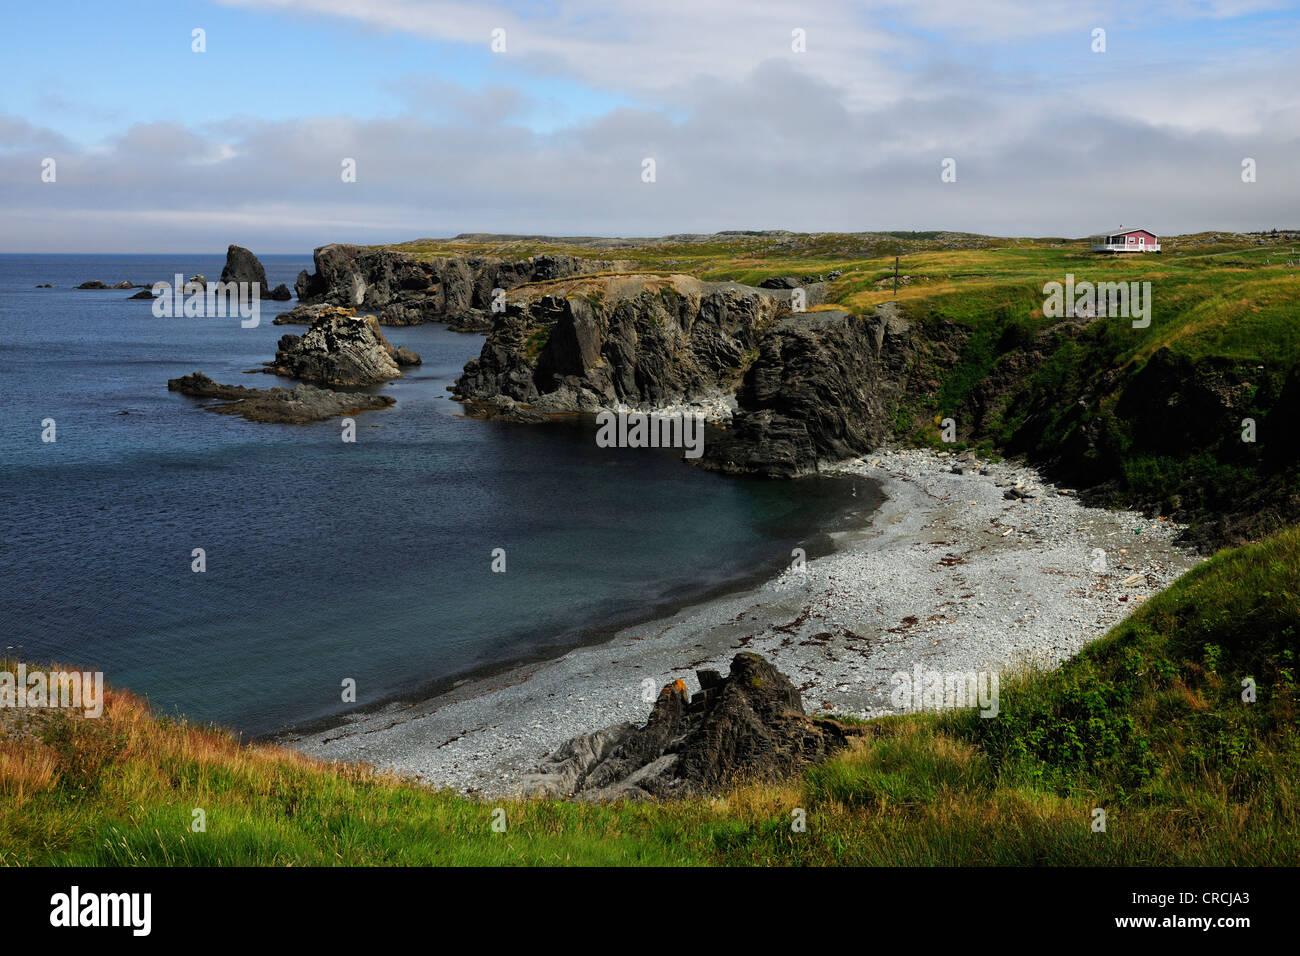 Coastline, Cape Bonavista, Newfoundland, Canada, North America - Stock Image